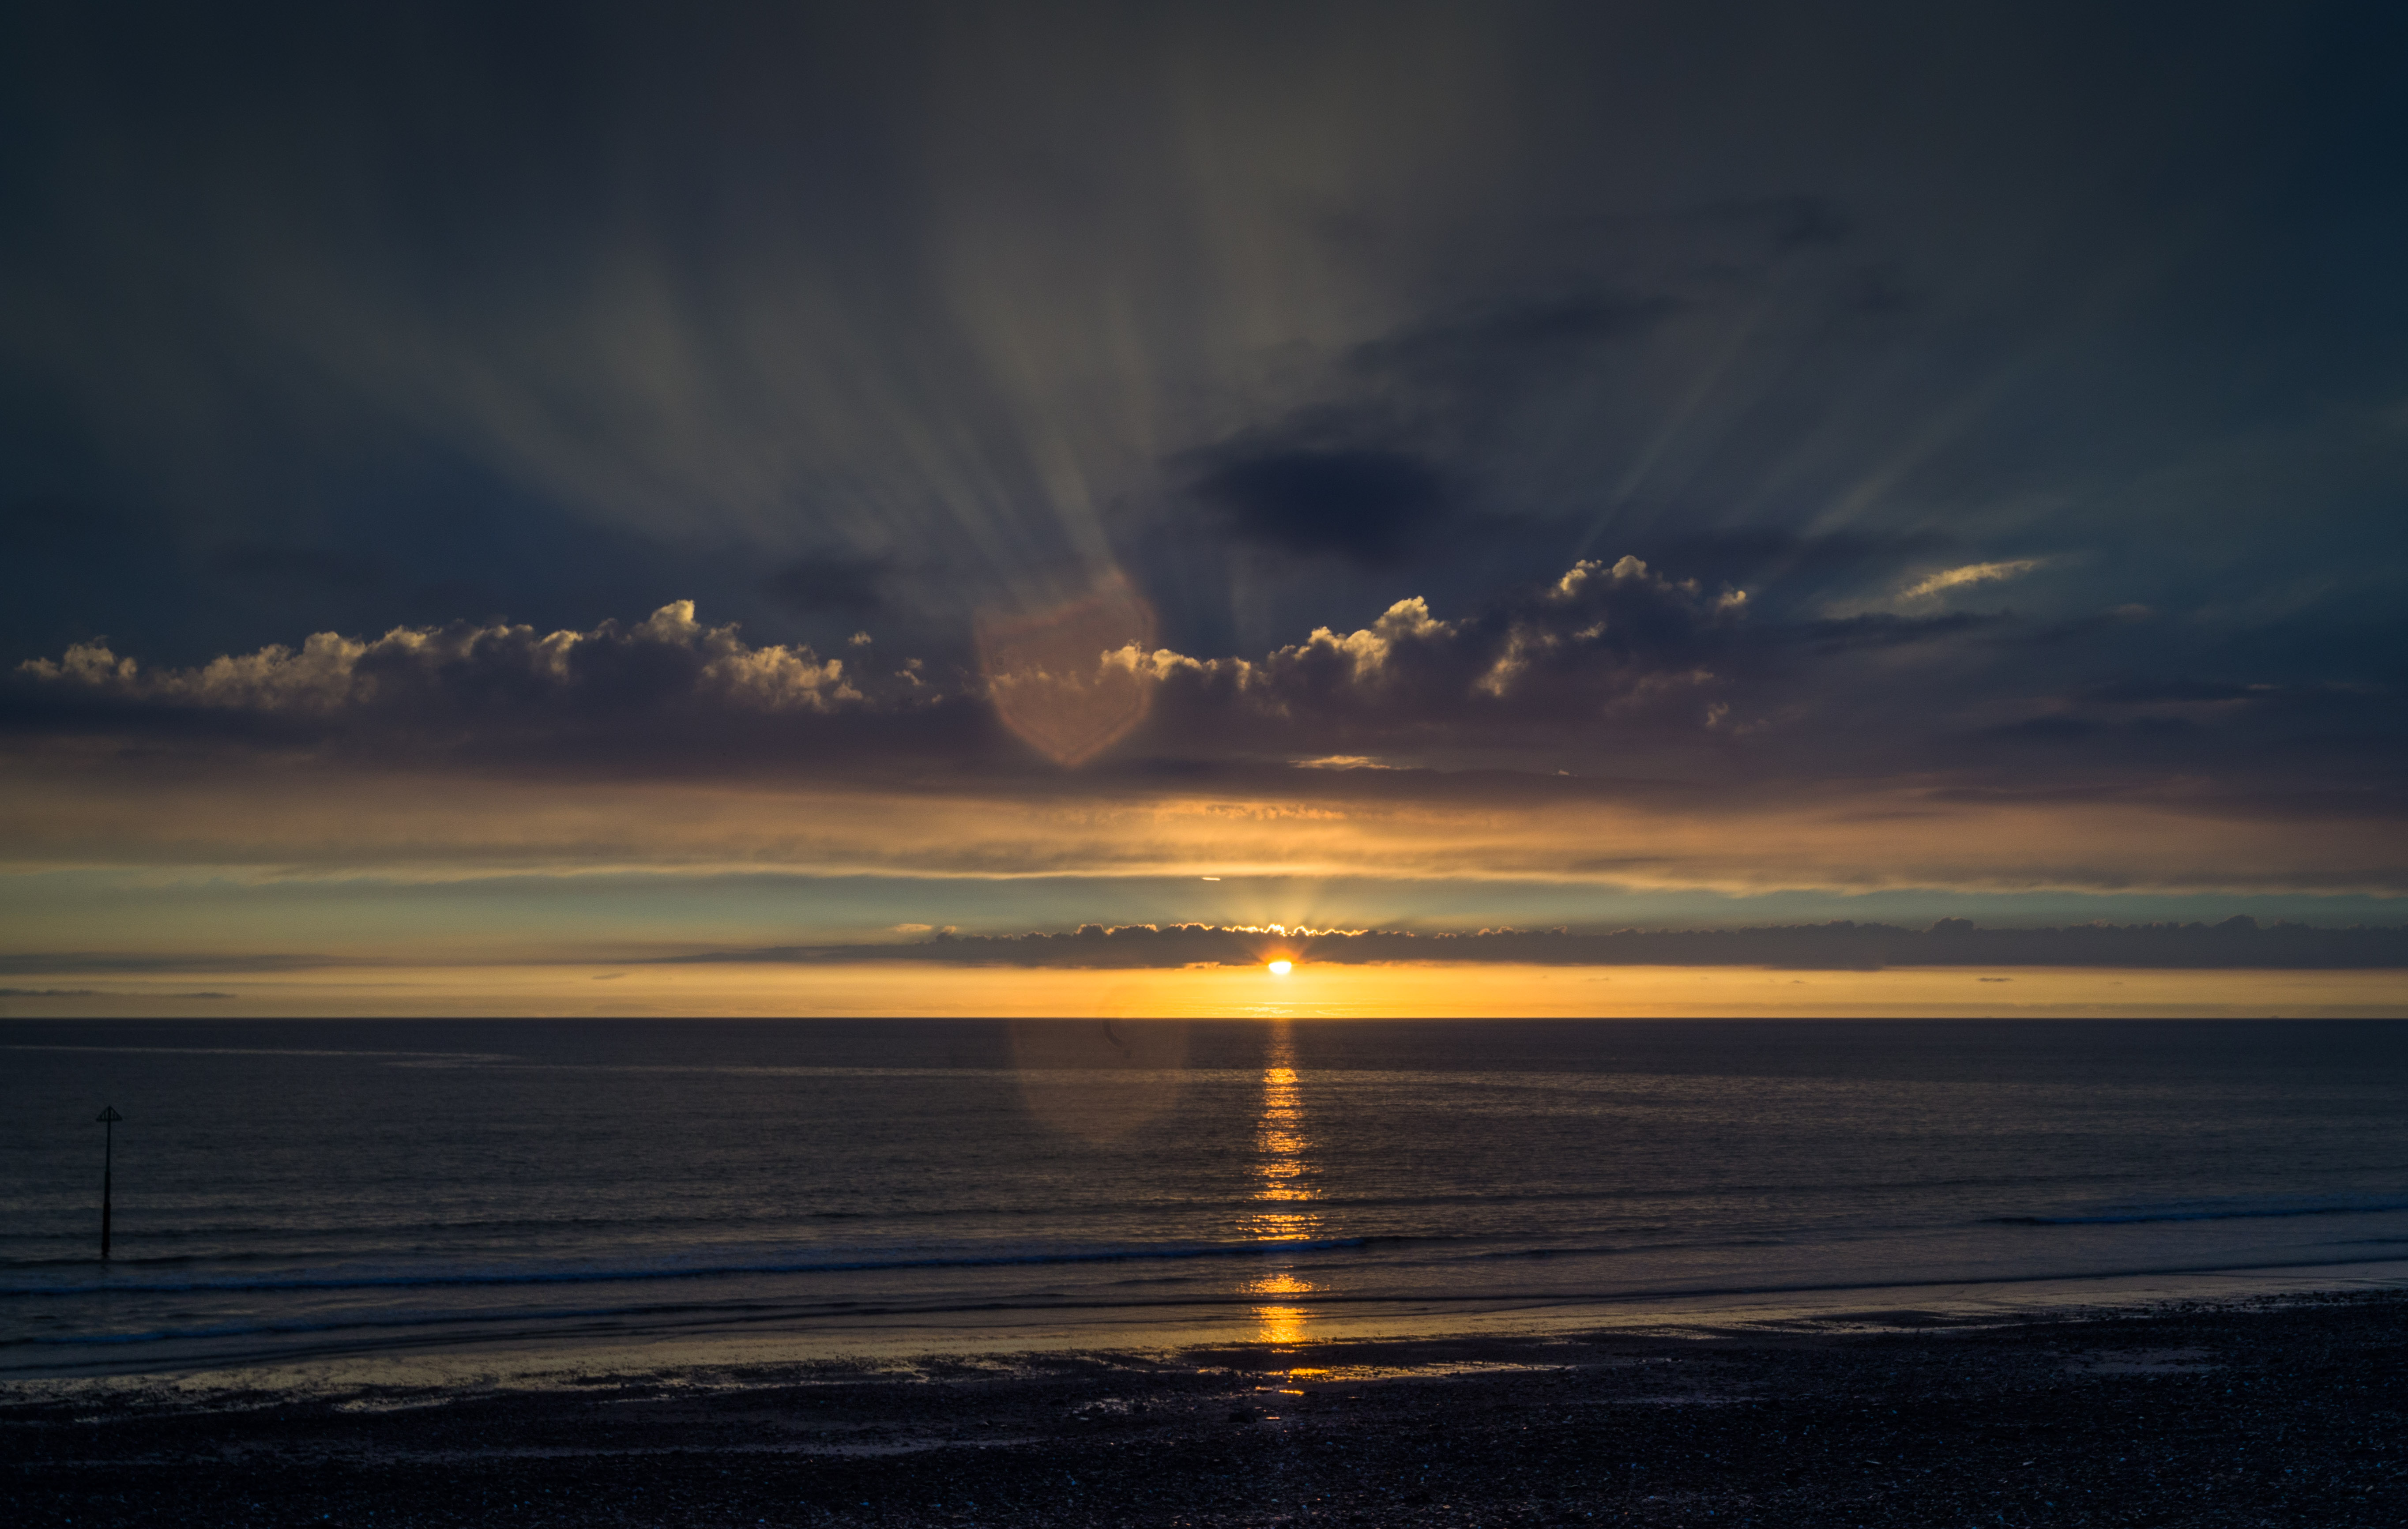 111280 скачать обои Закат, Вода, Море, Природа, Небо, Облака, Горизонт - заставки и картинки бесплатно